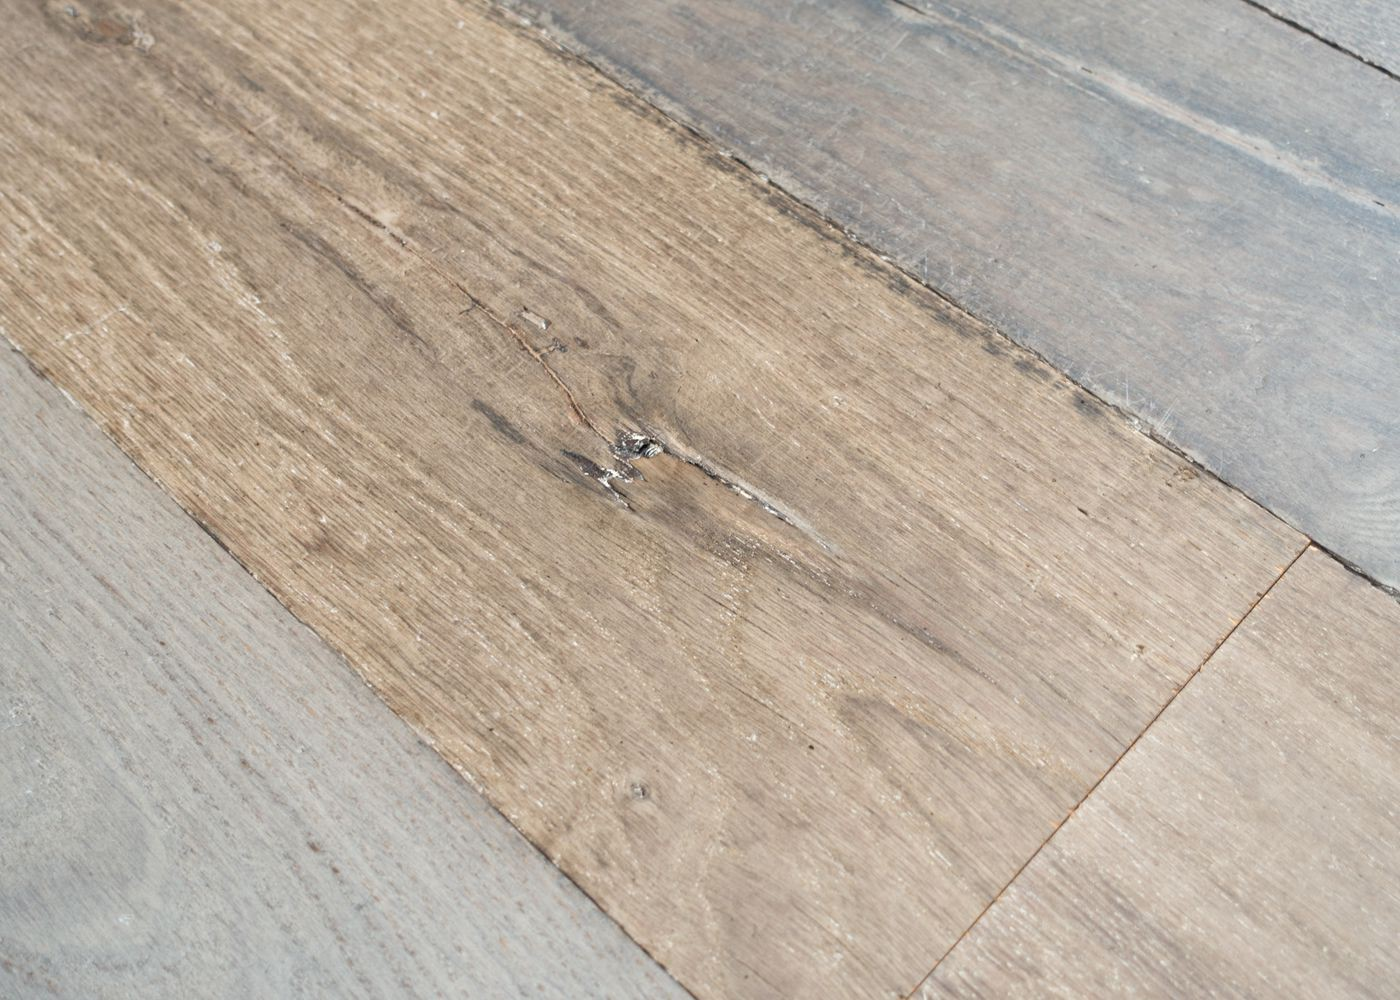 Plancher chêne massif PATCHWORK vieilli brut - PEFC rives abîmées 20x140-220x1800-2700